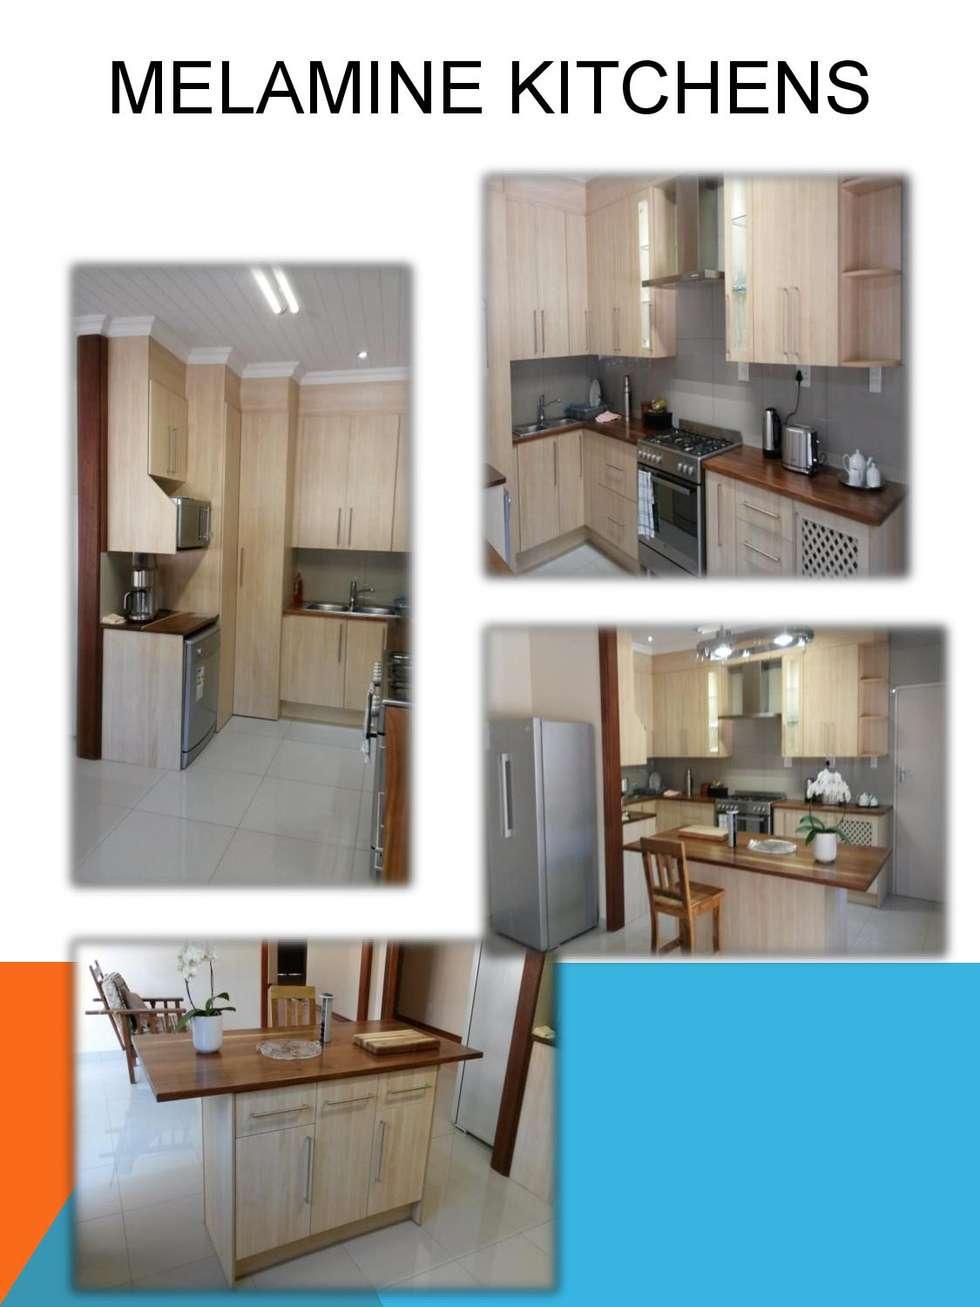 Melamine kitchen:  Kitchen units by SCD Kitchens